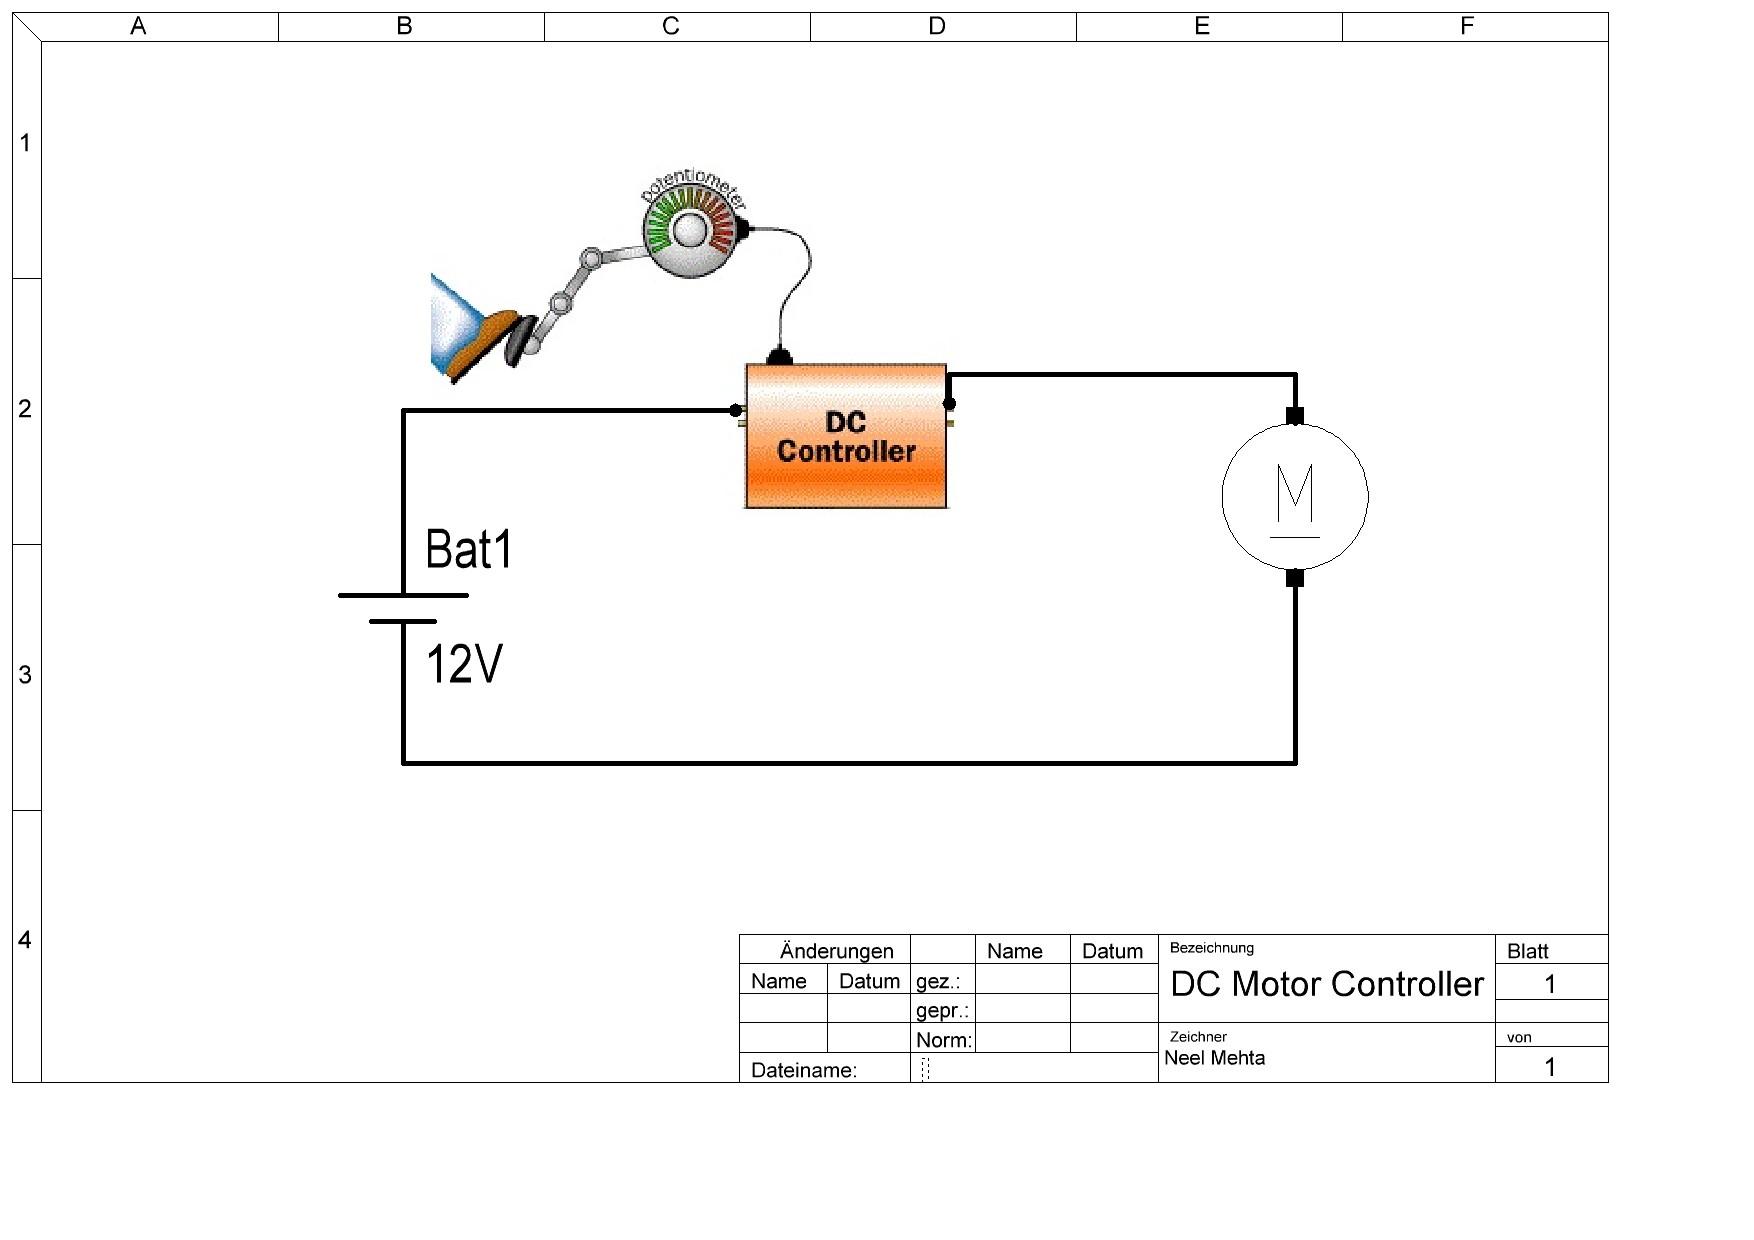 hight resolution of wiring potentiometer to dc motor wiring diagram world dc motor controller mehtaneel wiring potentiometer to dc